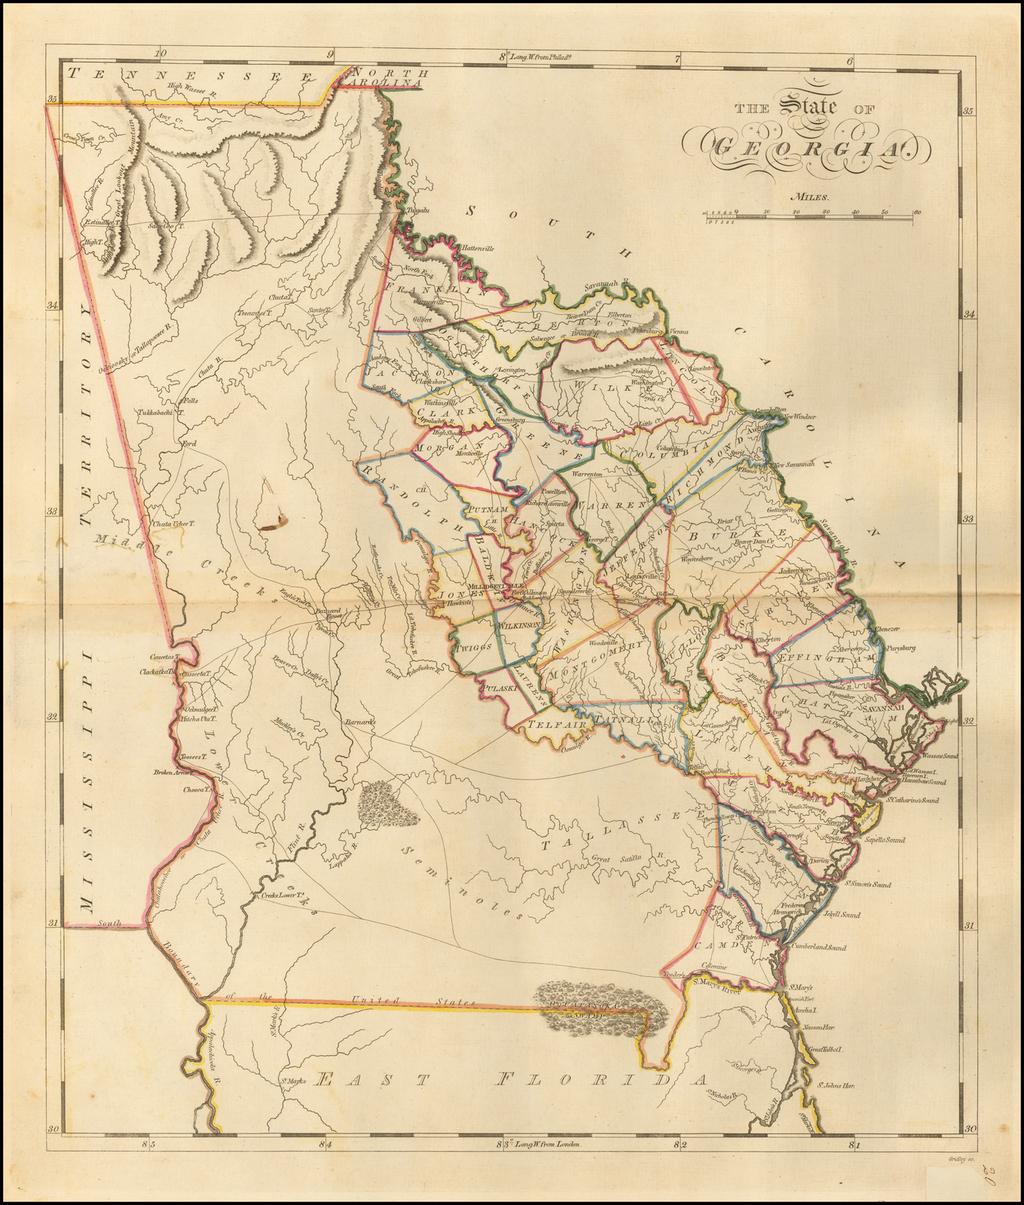 The State of Georgia By Mathew Carey